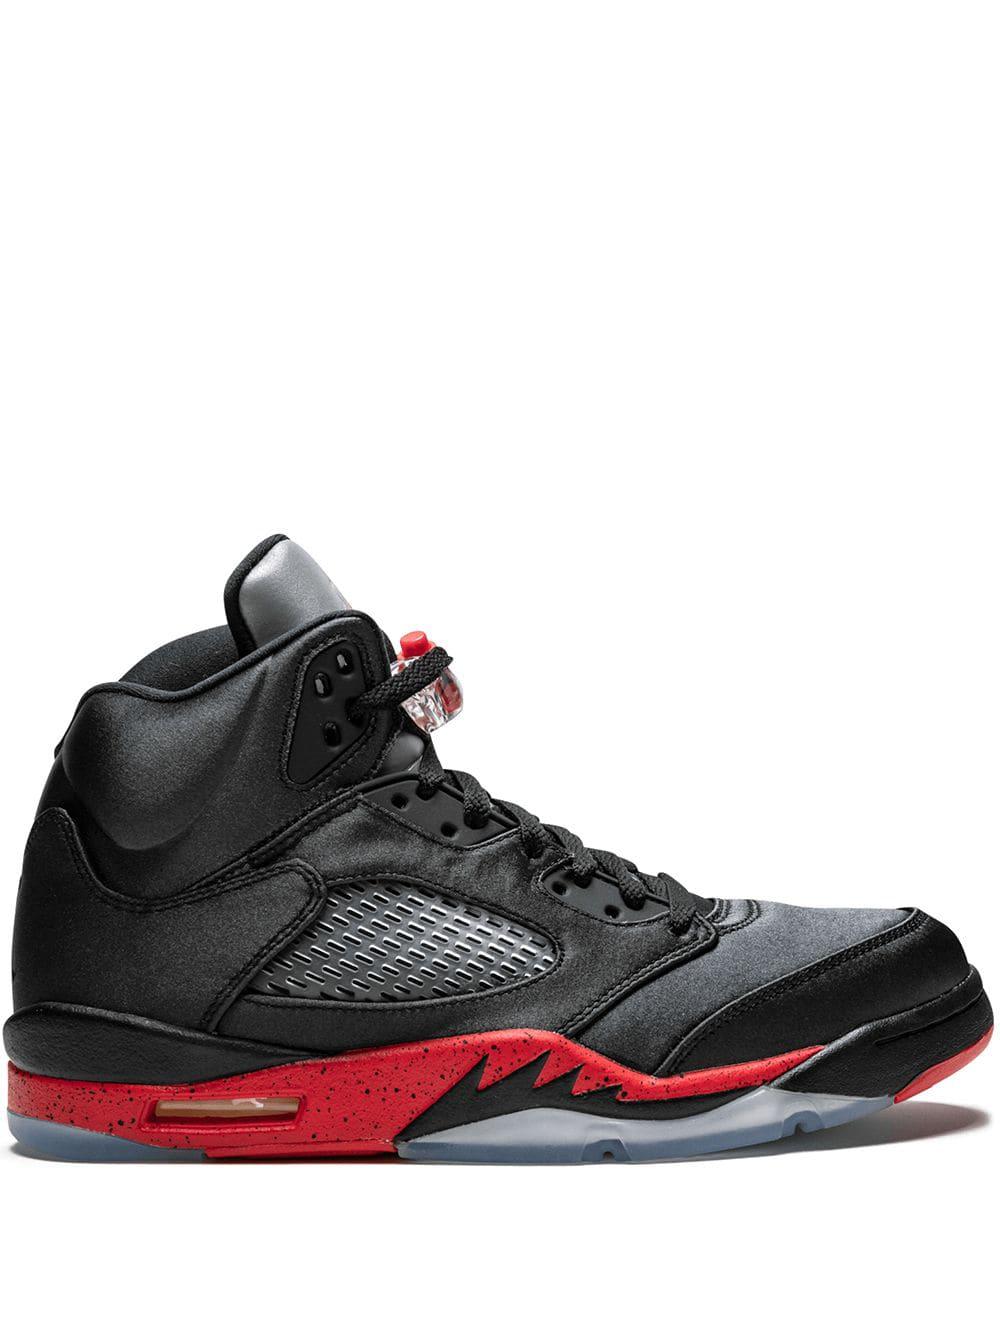 6a337ae8b6b76f Jordan Air 5 Retro Sneakers - Black